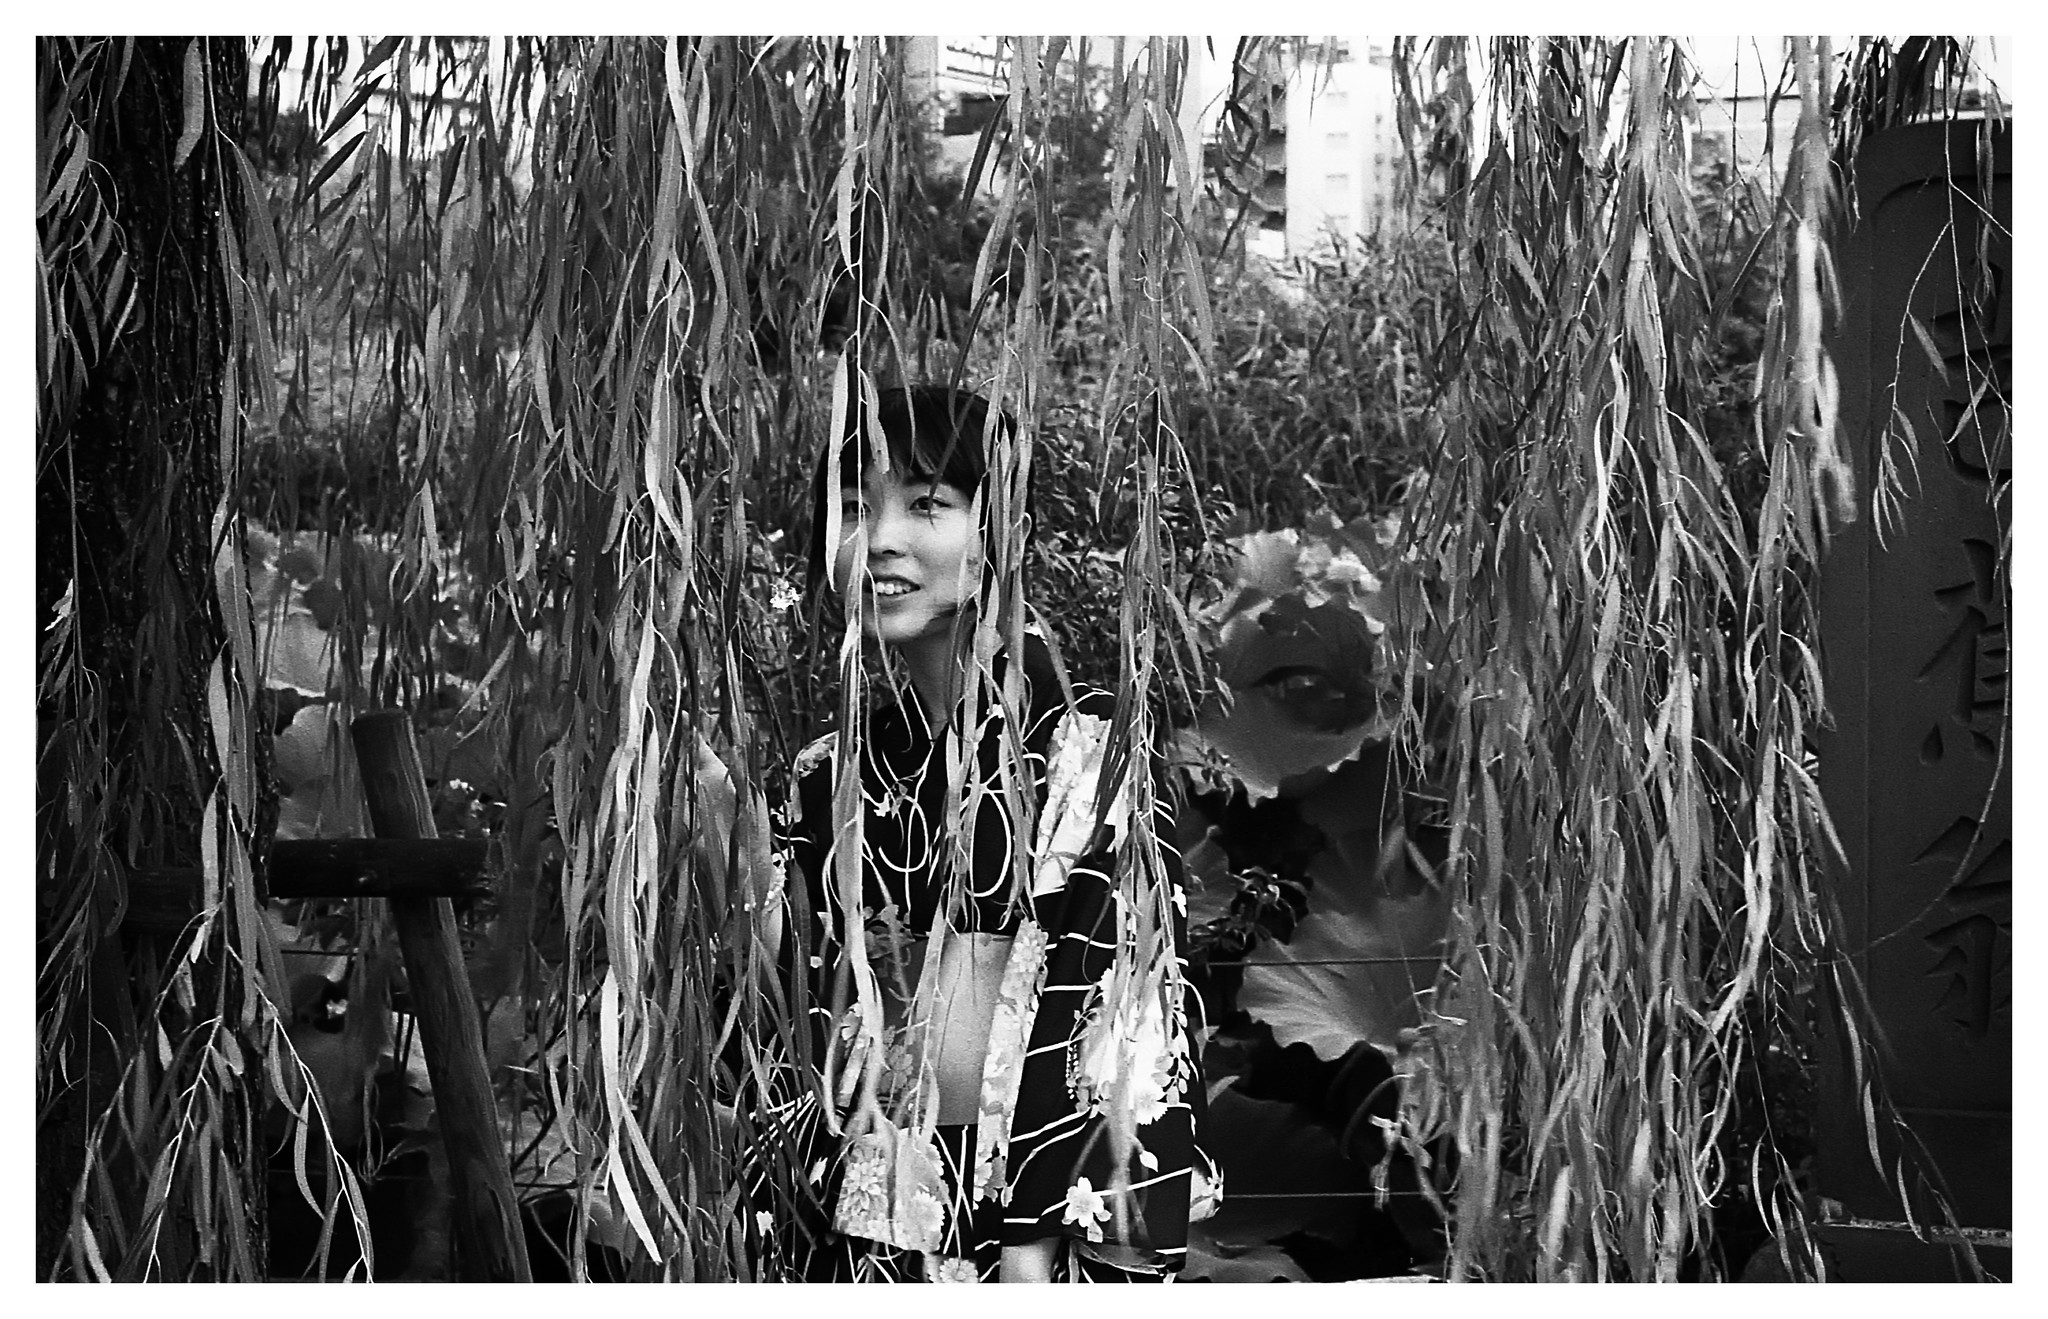 km400_tokyo_uenopark_plantgirl